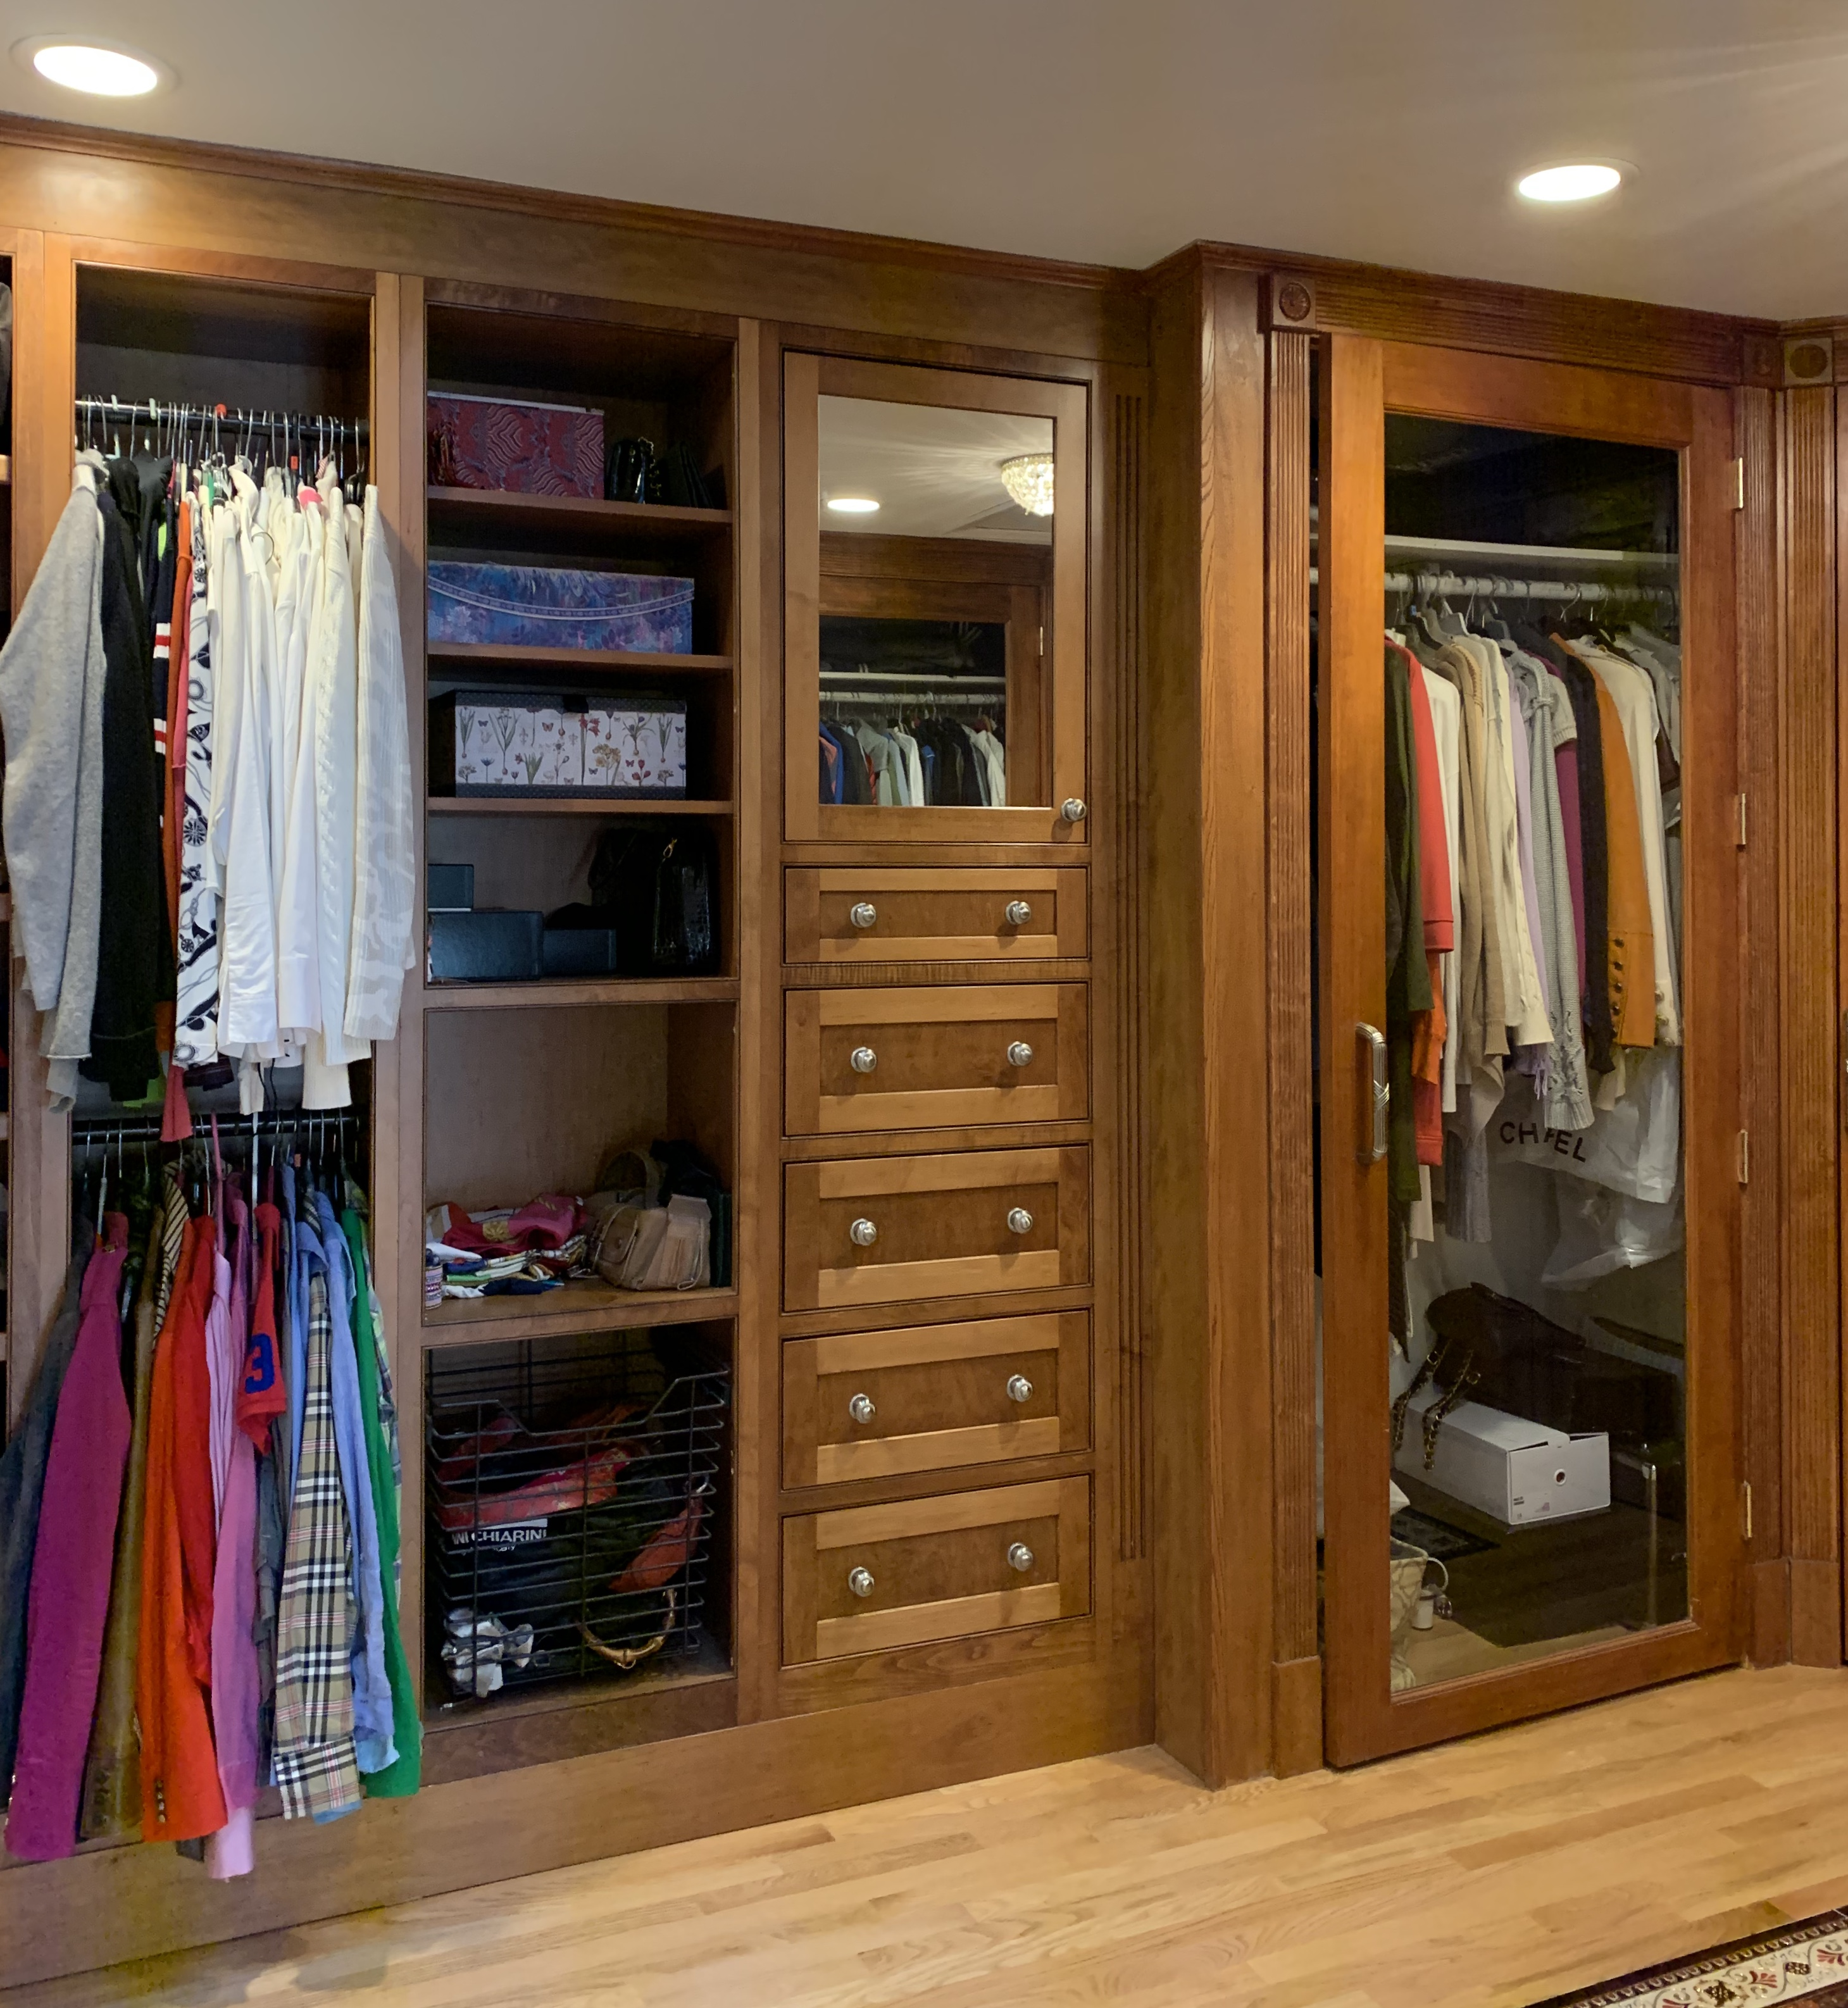 Condos With Walk-In Closets in Washington, DC